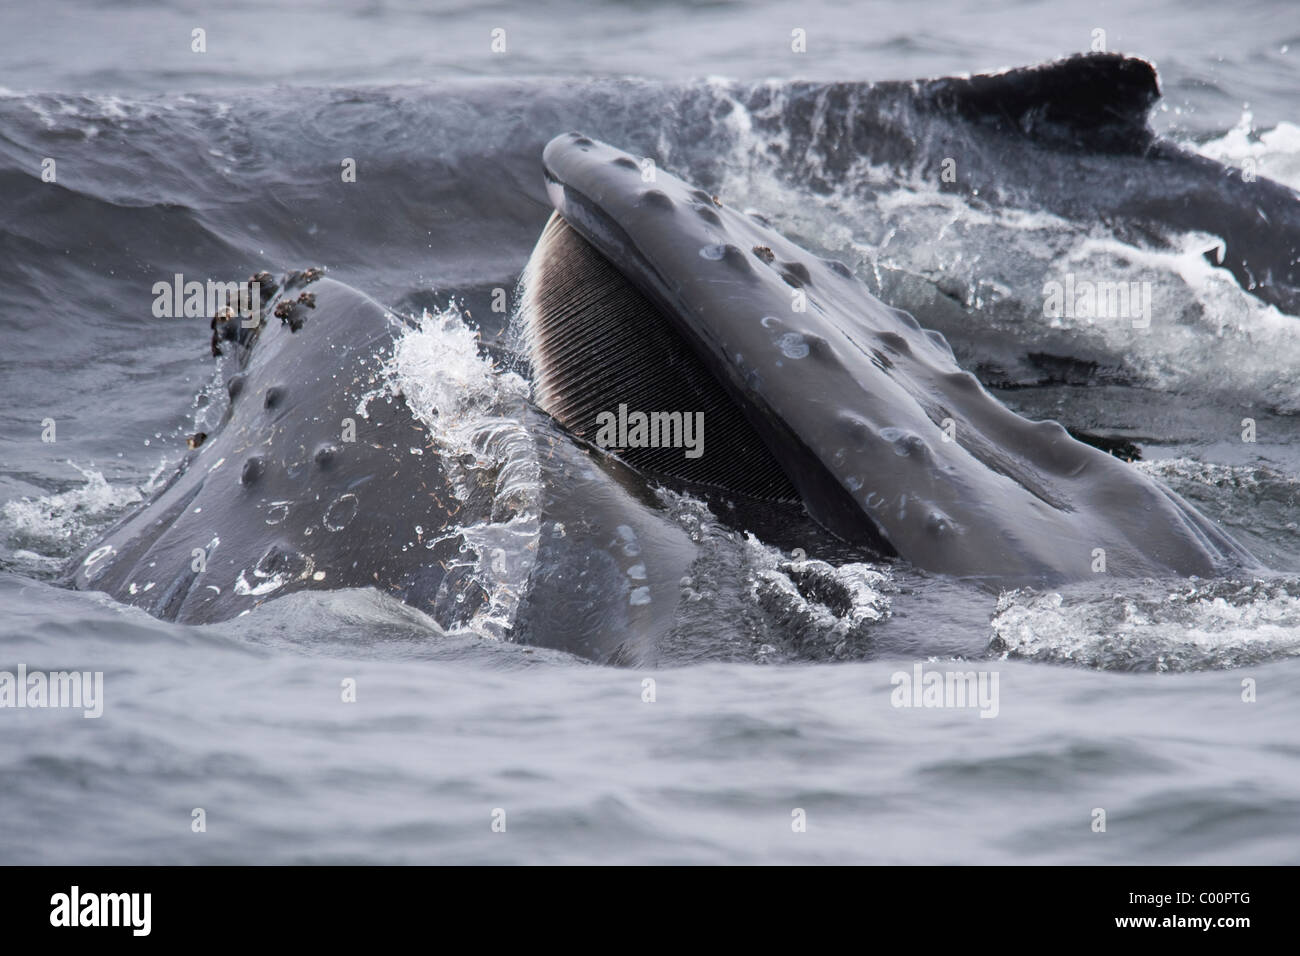 Humpback Whale (Megaptera novaeangliae) lunge-feeding on Krill. Monterey, California, Pacific Ocean. - Stock Image